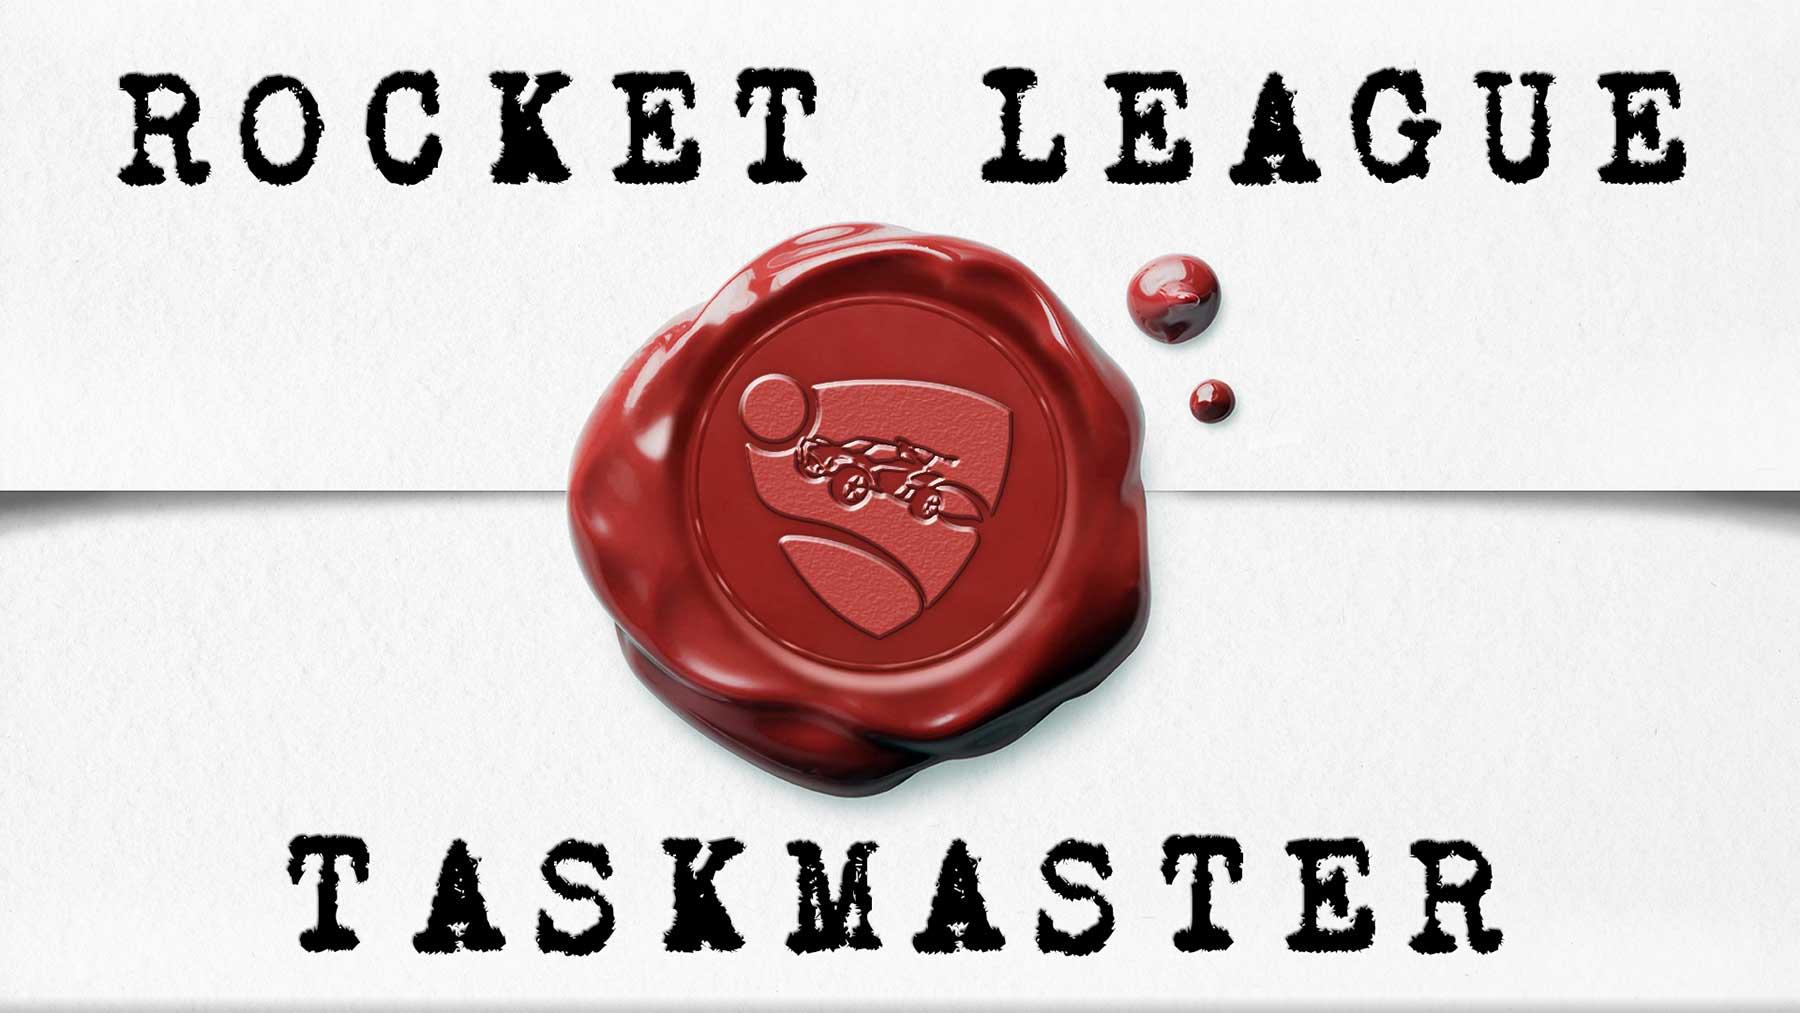 Rocket League Taskmaster – Teil 3: Wer schafft den härtesten Schuss? THUMB_01